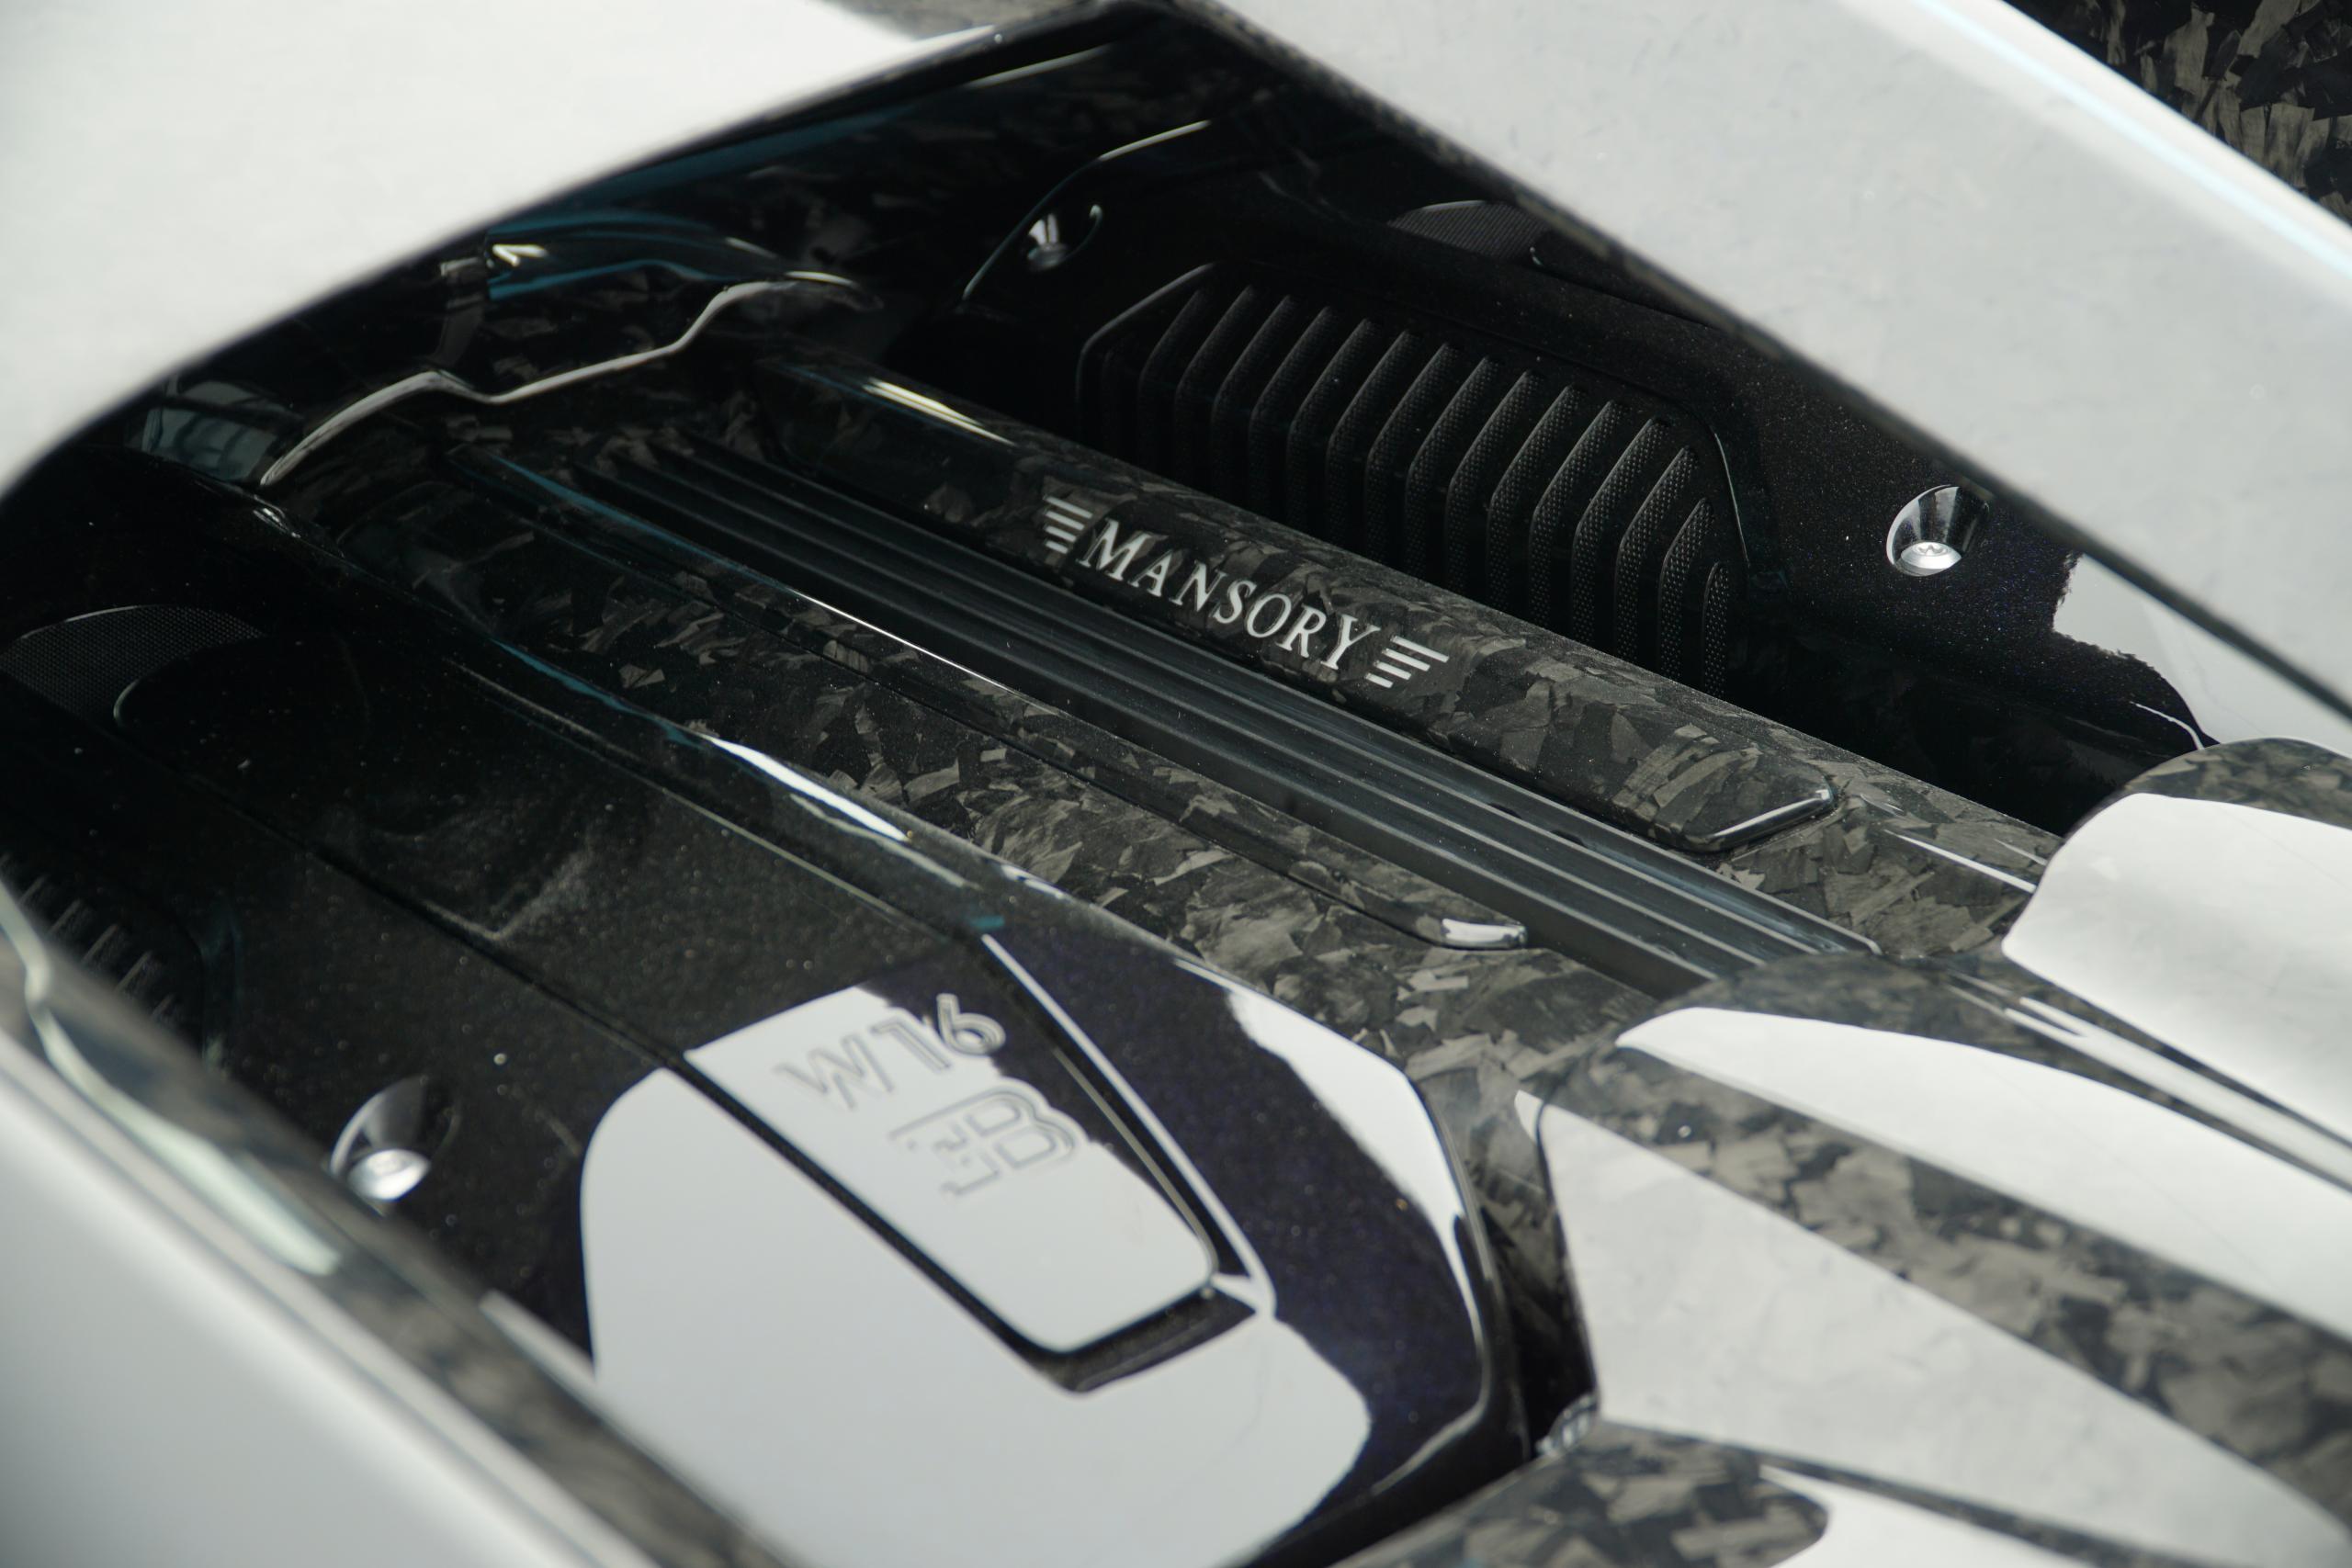 Mansory迈莎锐布加迪凯龙终极超级跑车,定制咨询:15088779054